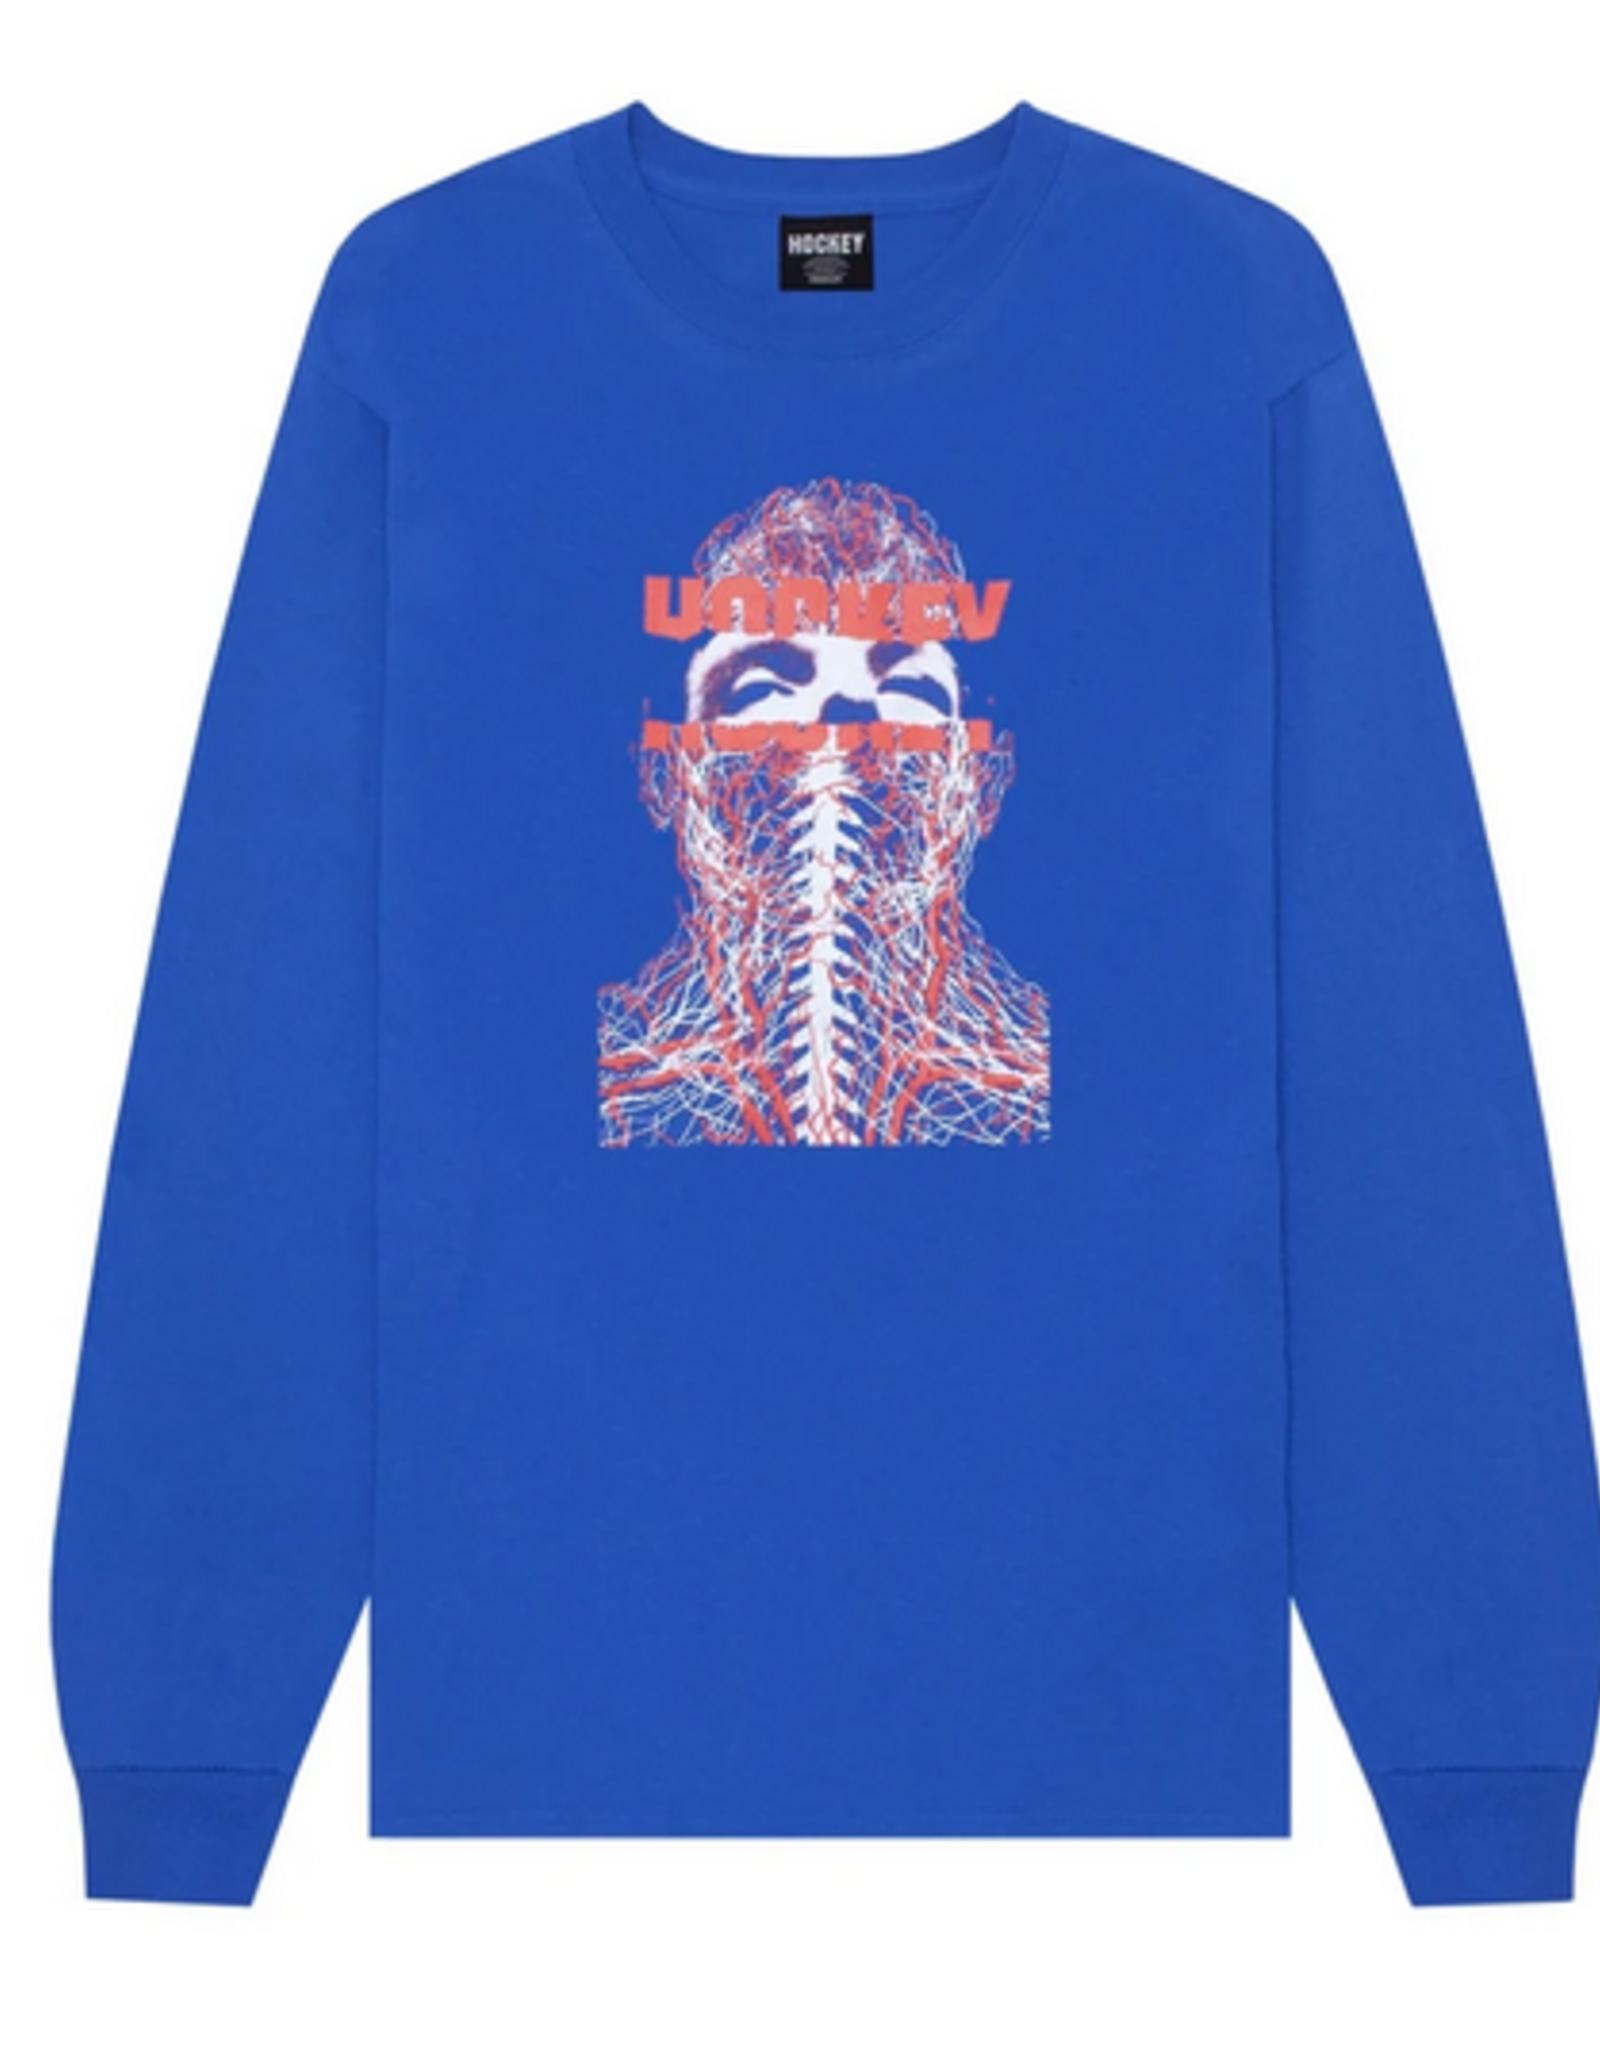 HOCKEY HOCKEY NERVES L/S TEE SHIRT ROYAL BLUE